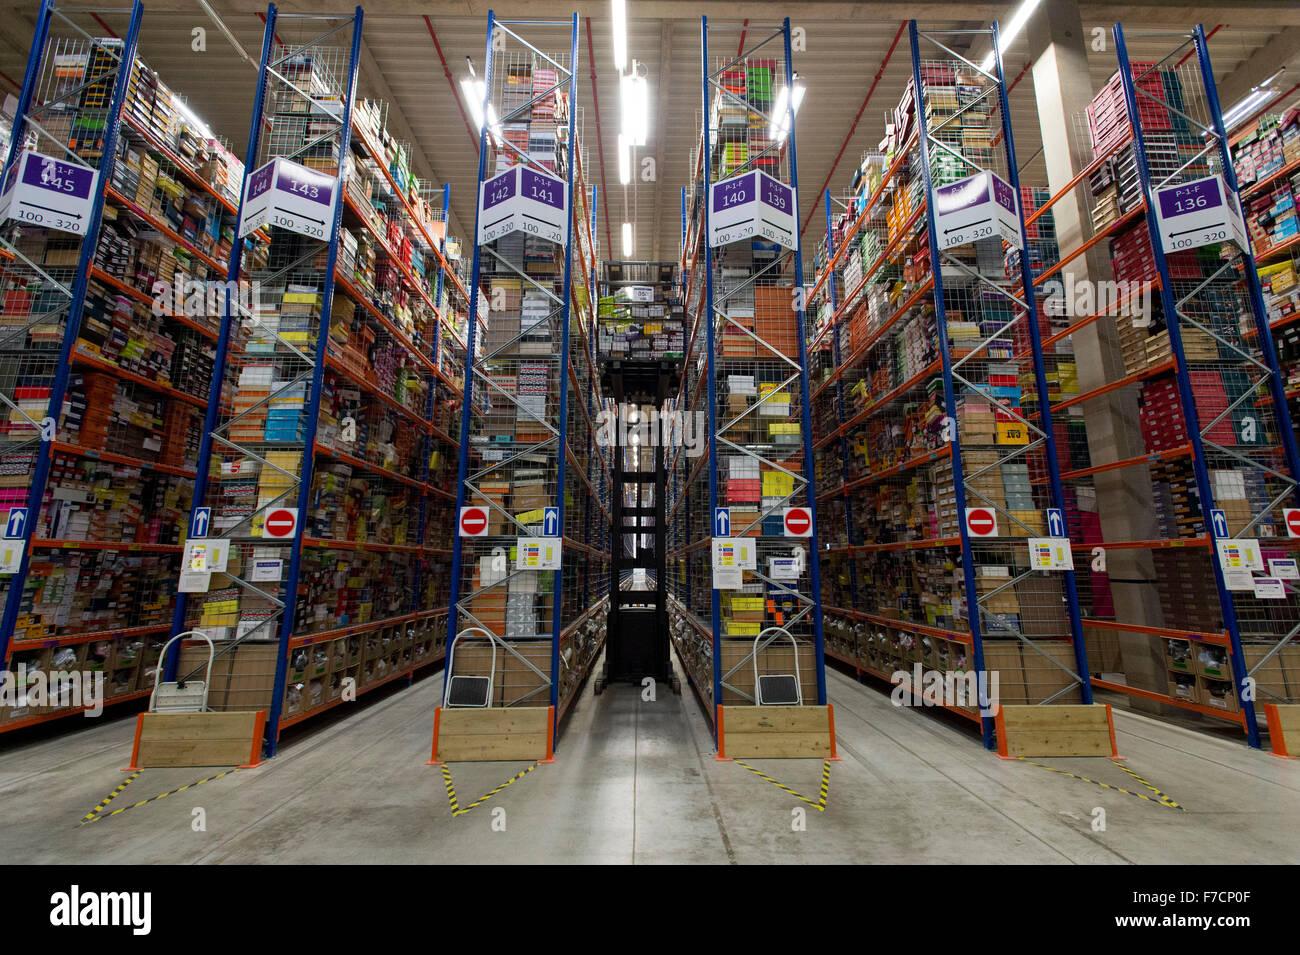 The Amazon warehouse fulfillment centre in Swansea, South ...